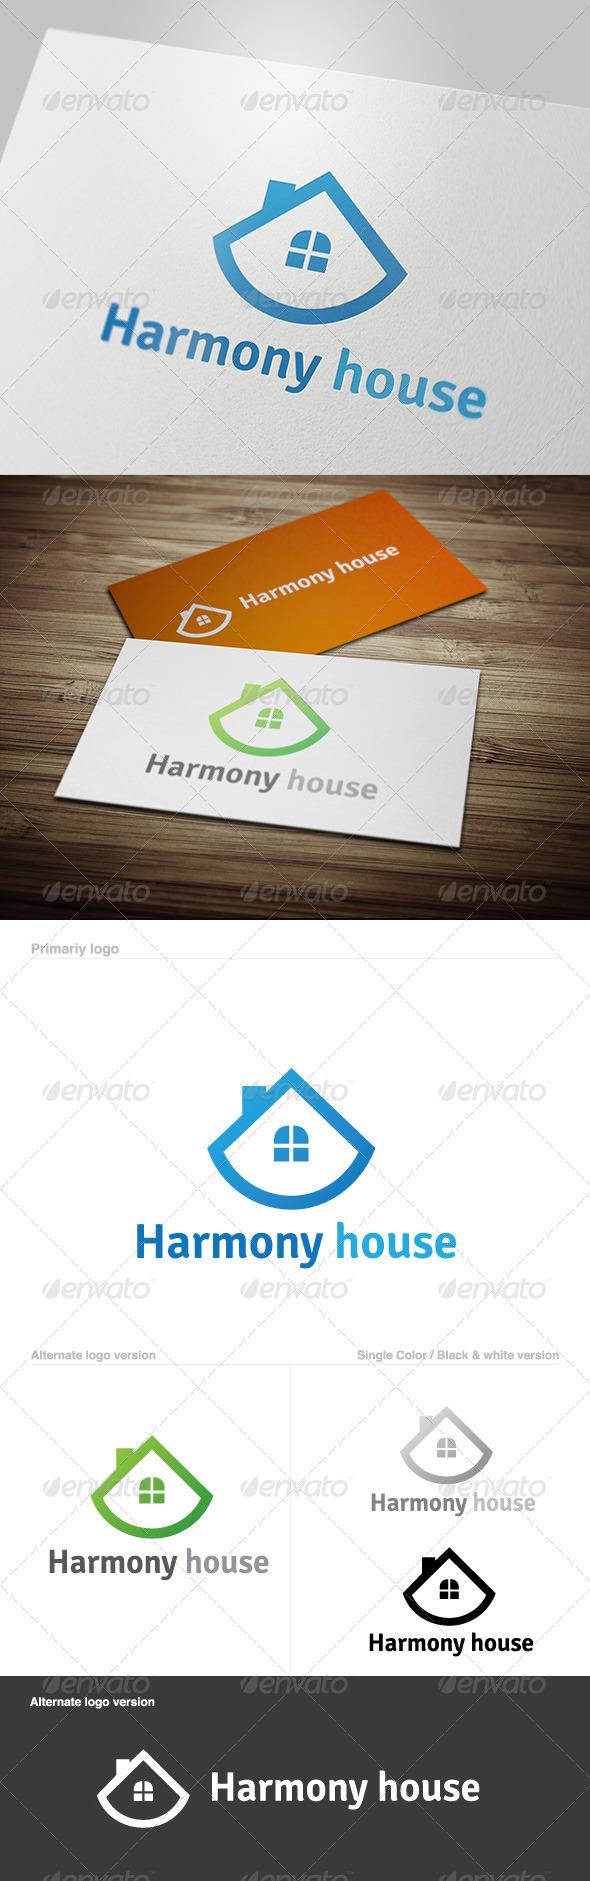 GraphicRiver Harmony House Logo 5629702